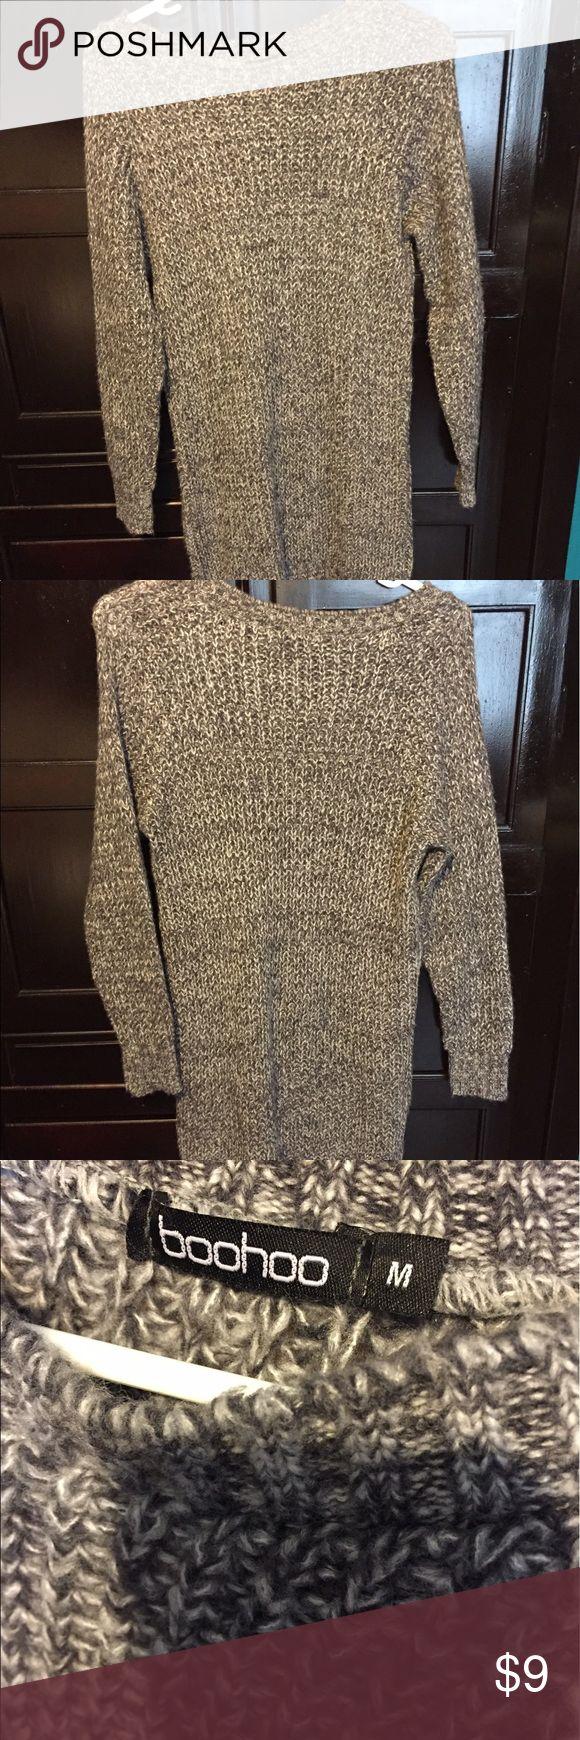 Grey Long Sleeve Sweater Dress Never worn - great condition! Boohoo Dresses Long Sleeve